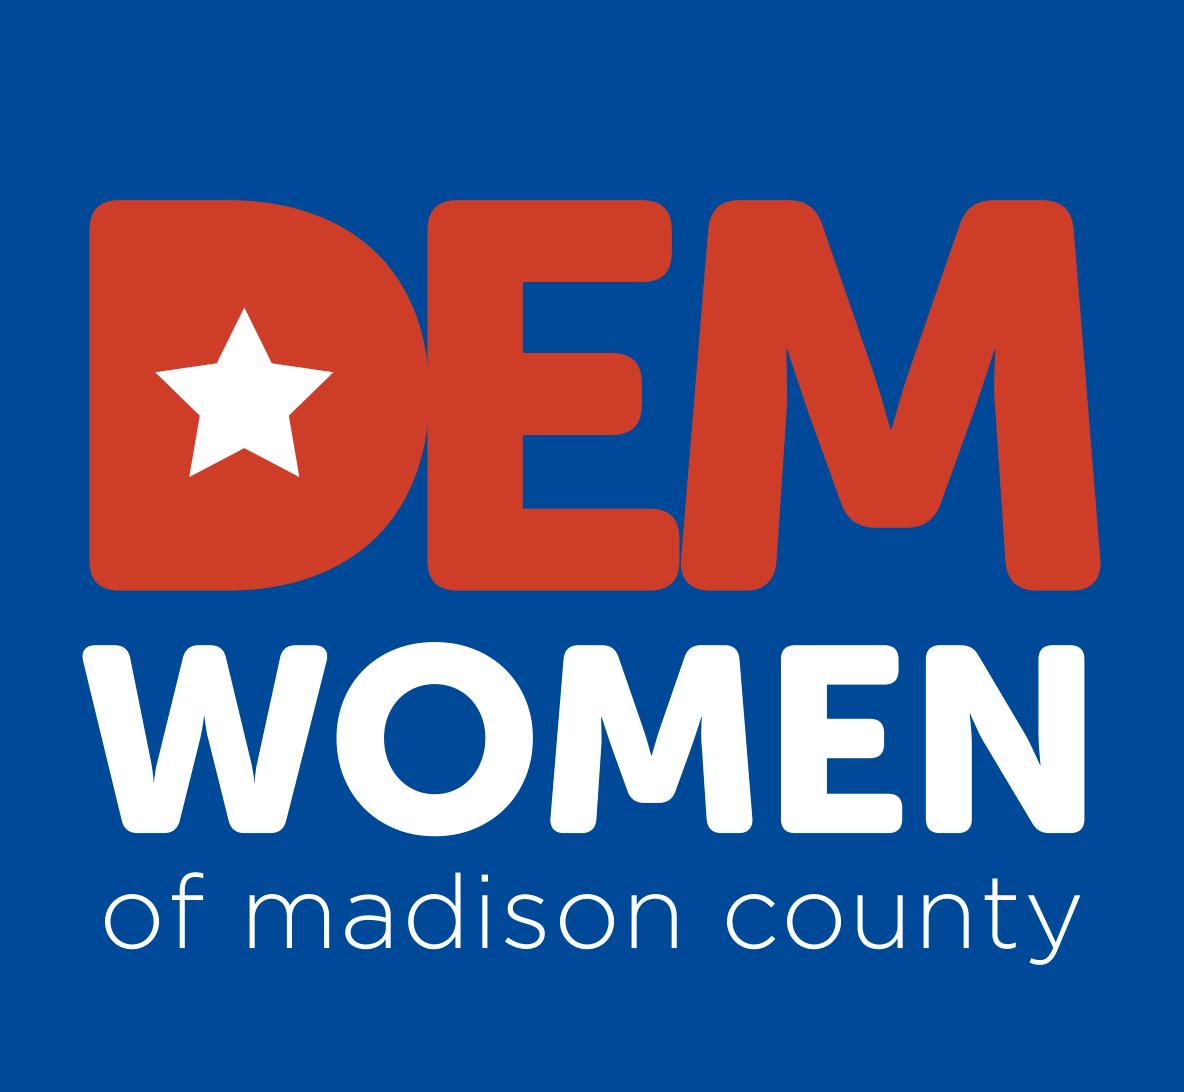 Democratic Women of Madison County